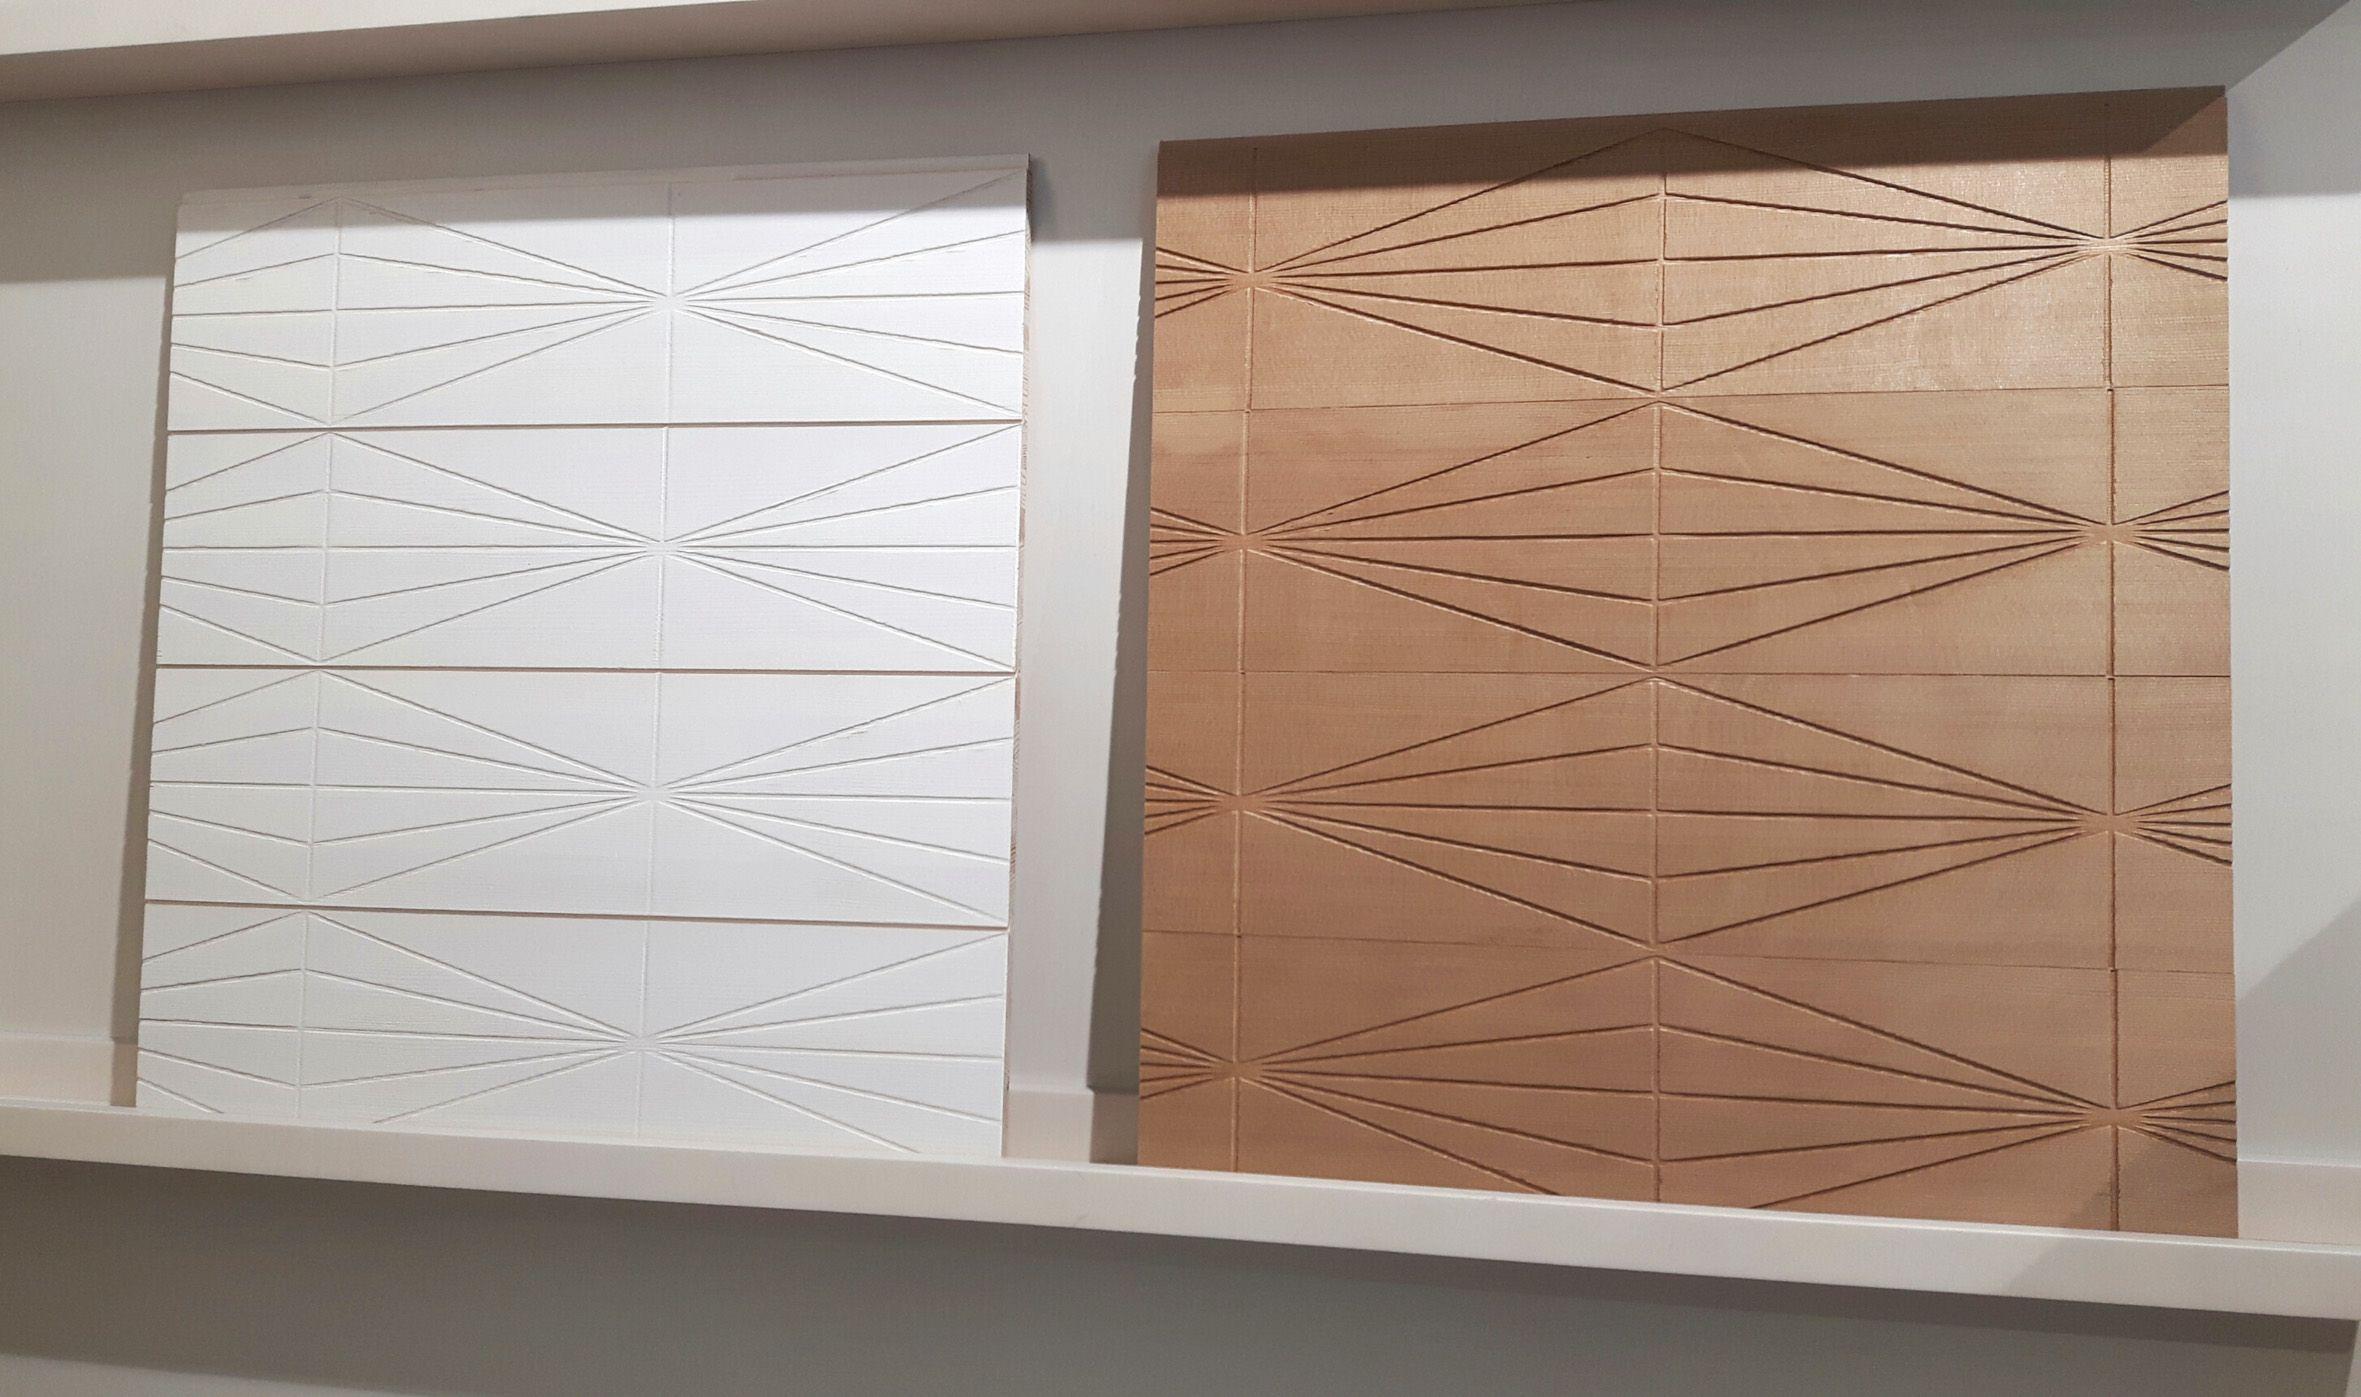 #karelldesign #woodpanels #finnishdesign